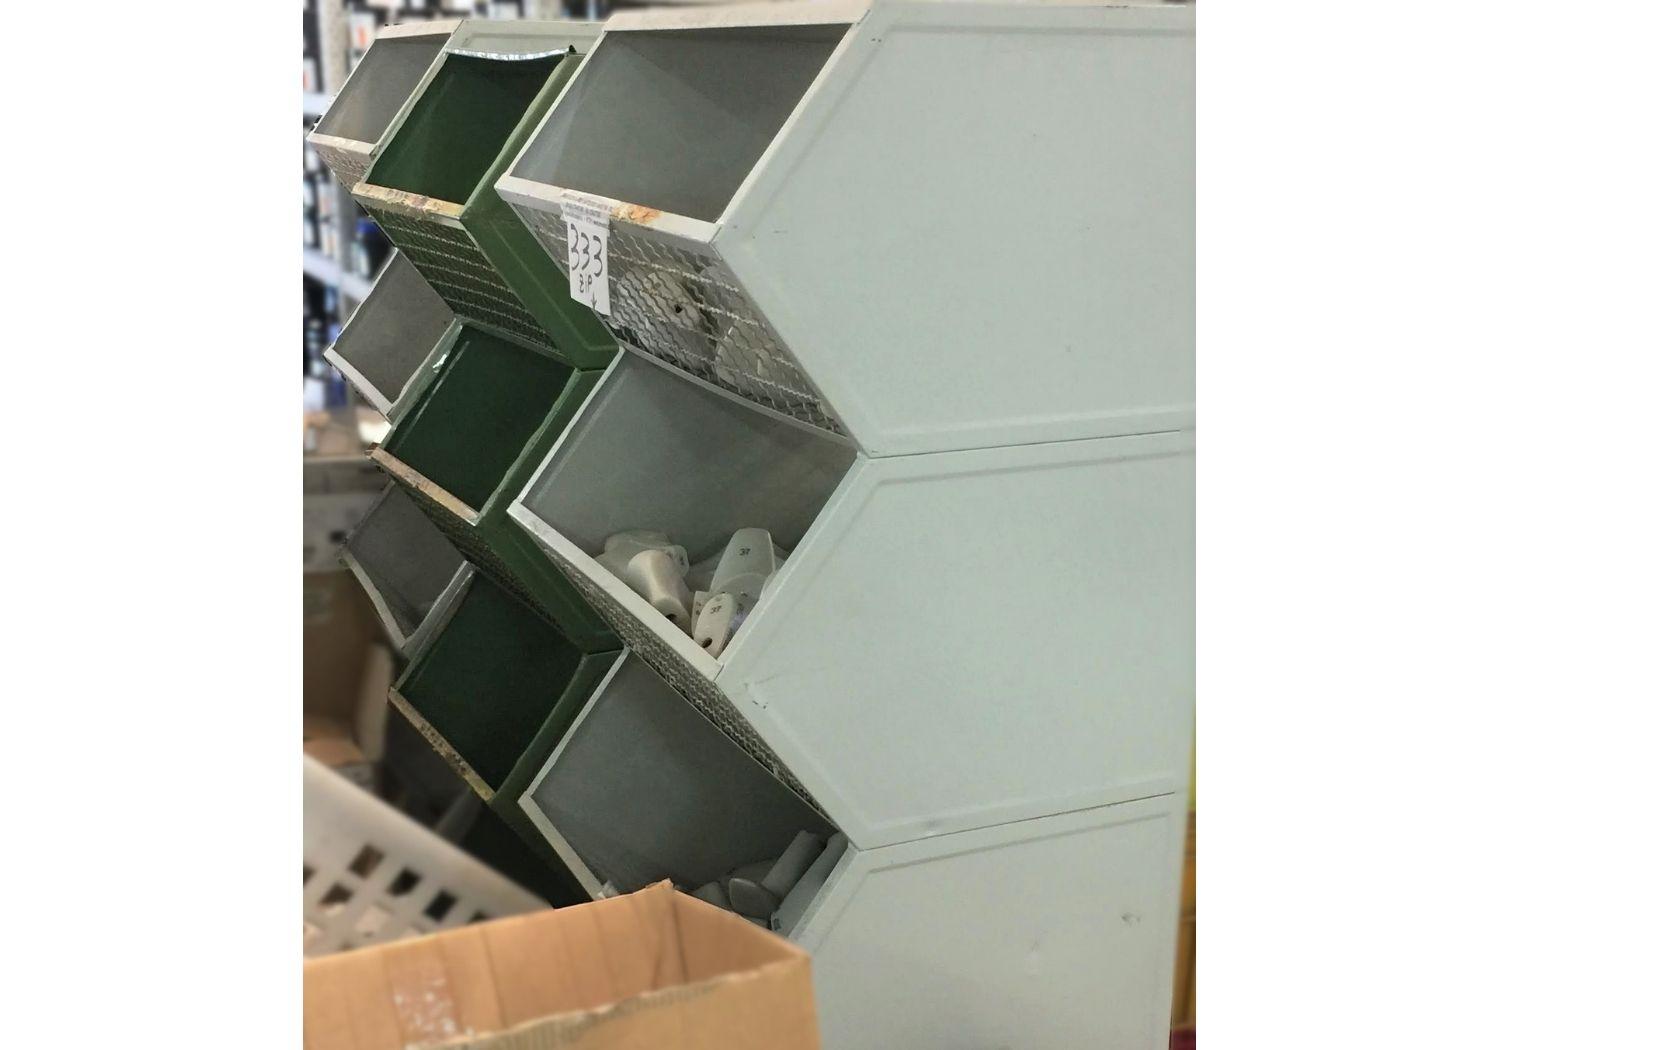 SHOES-LASTS BOX